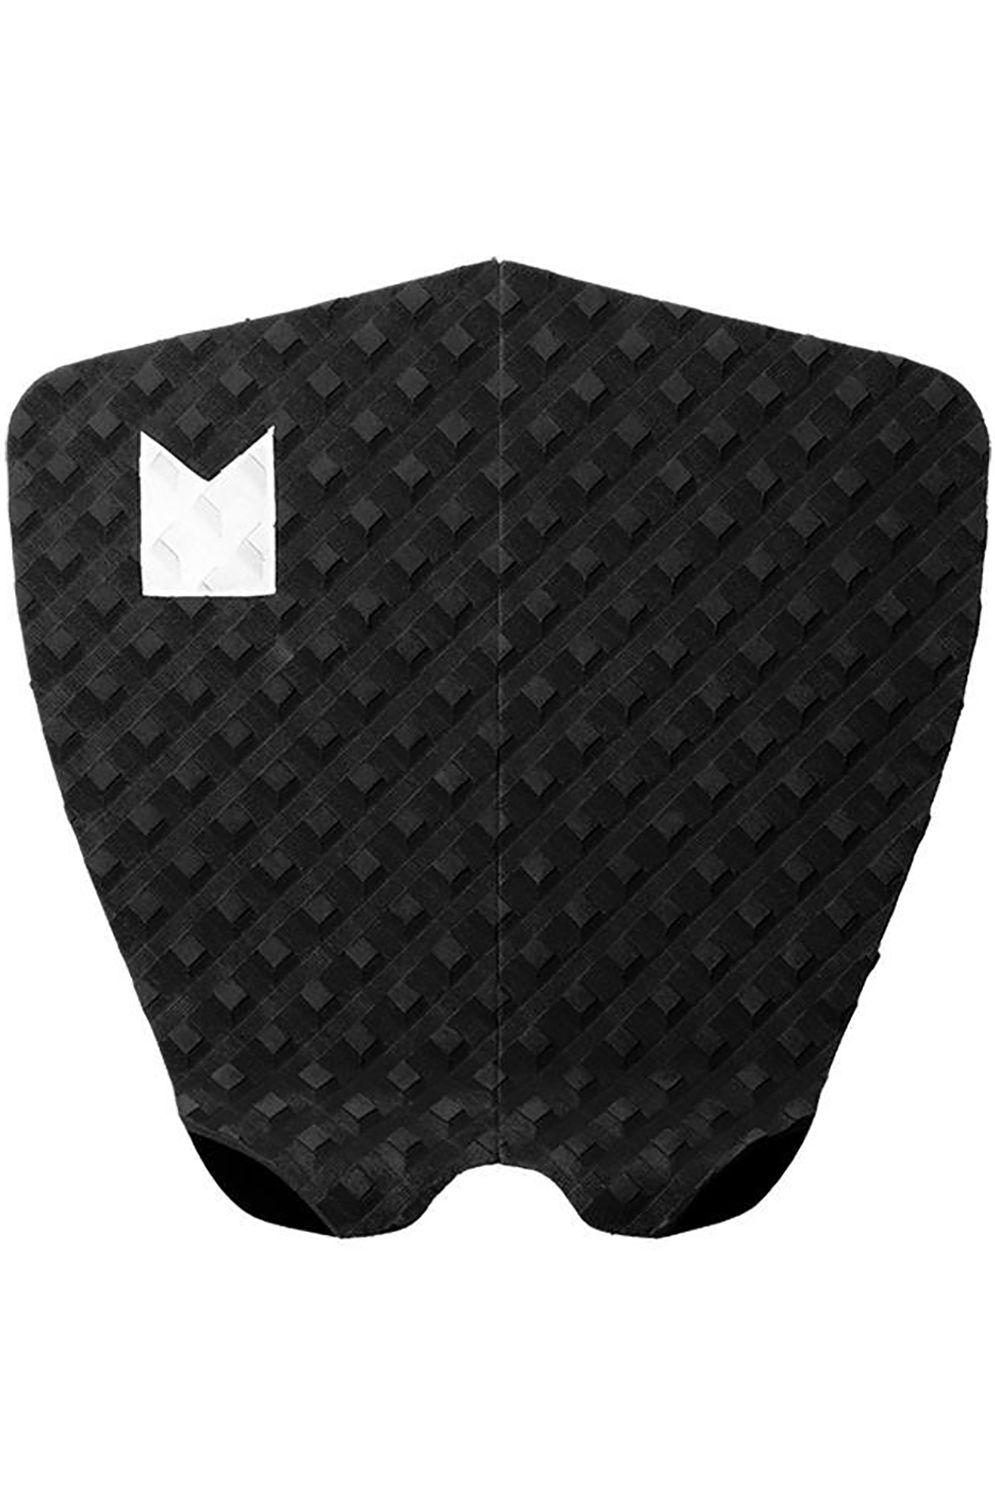 Modom Deck BLACKNESS 11 Black